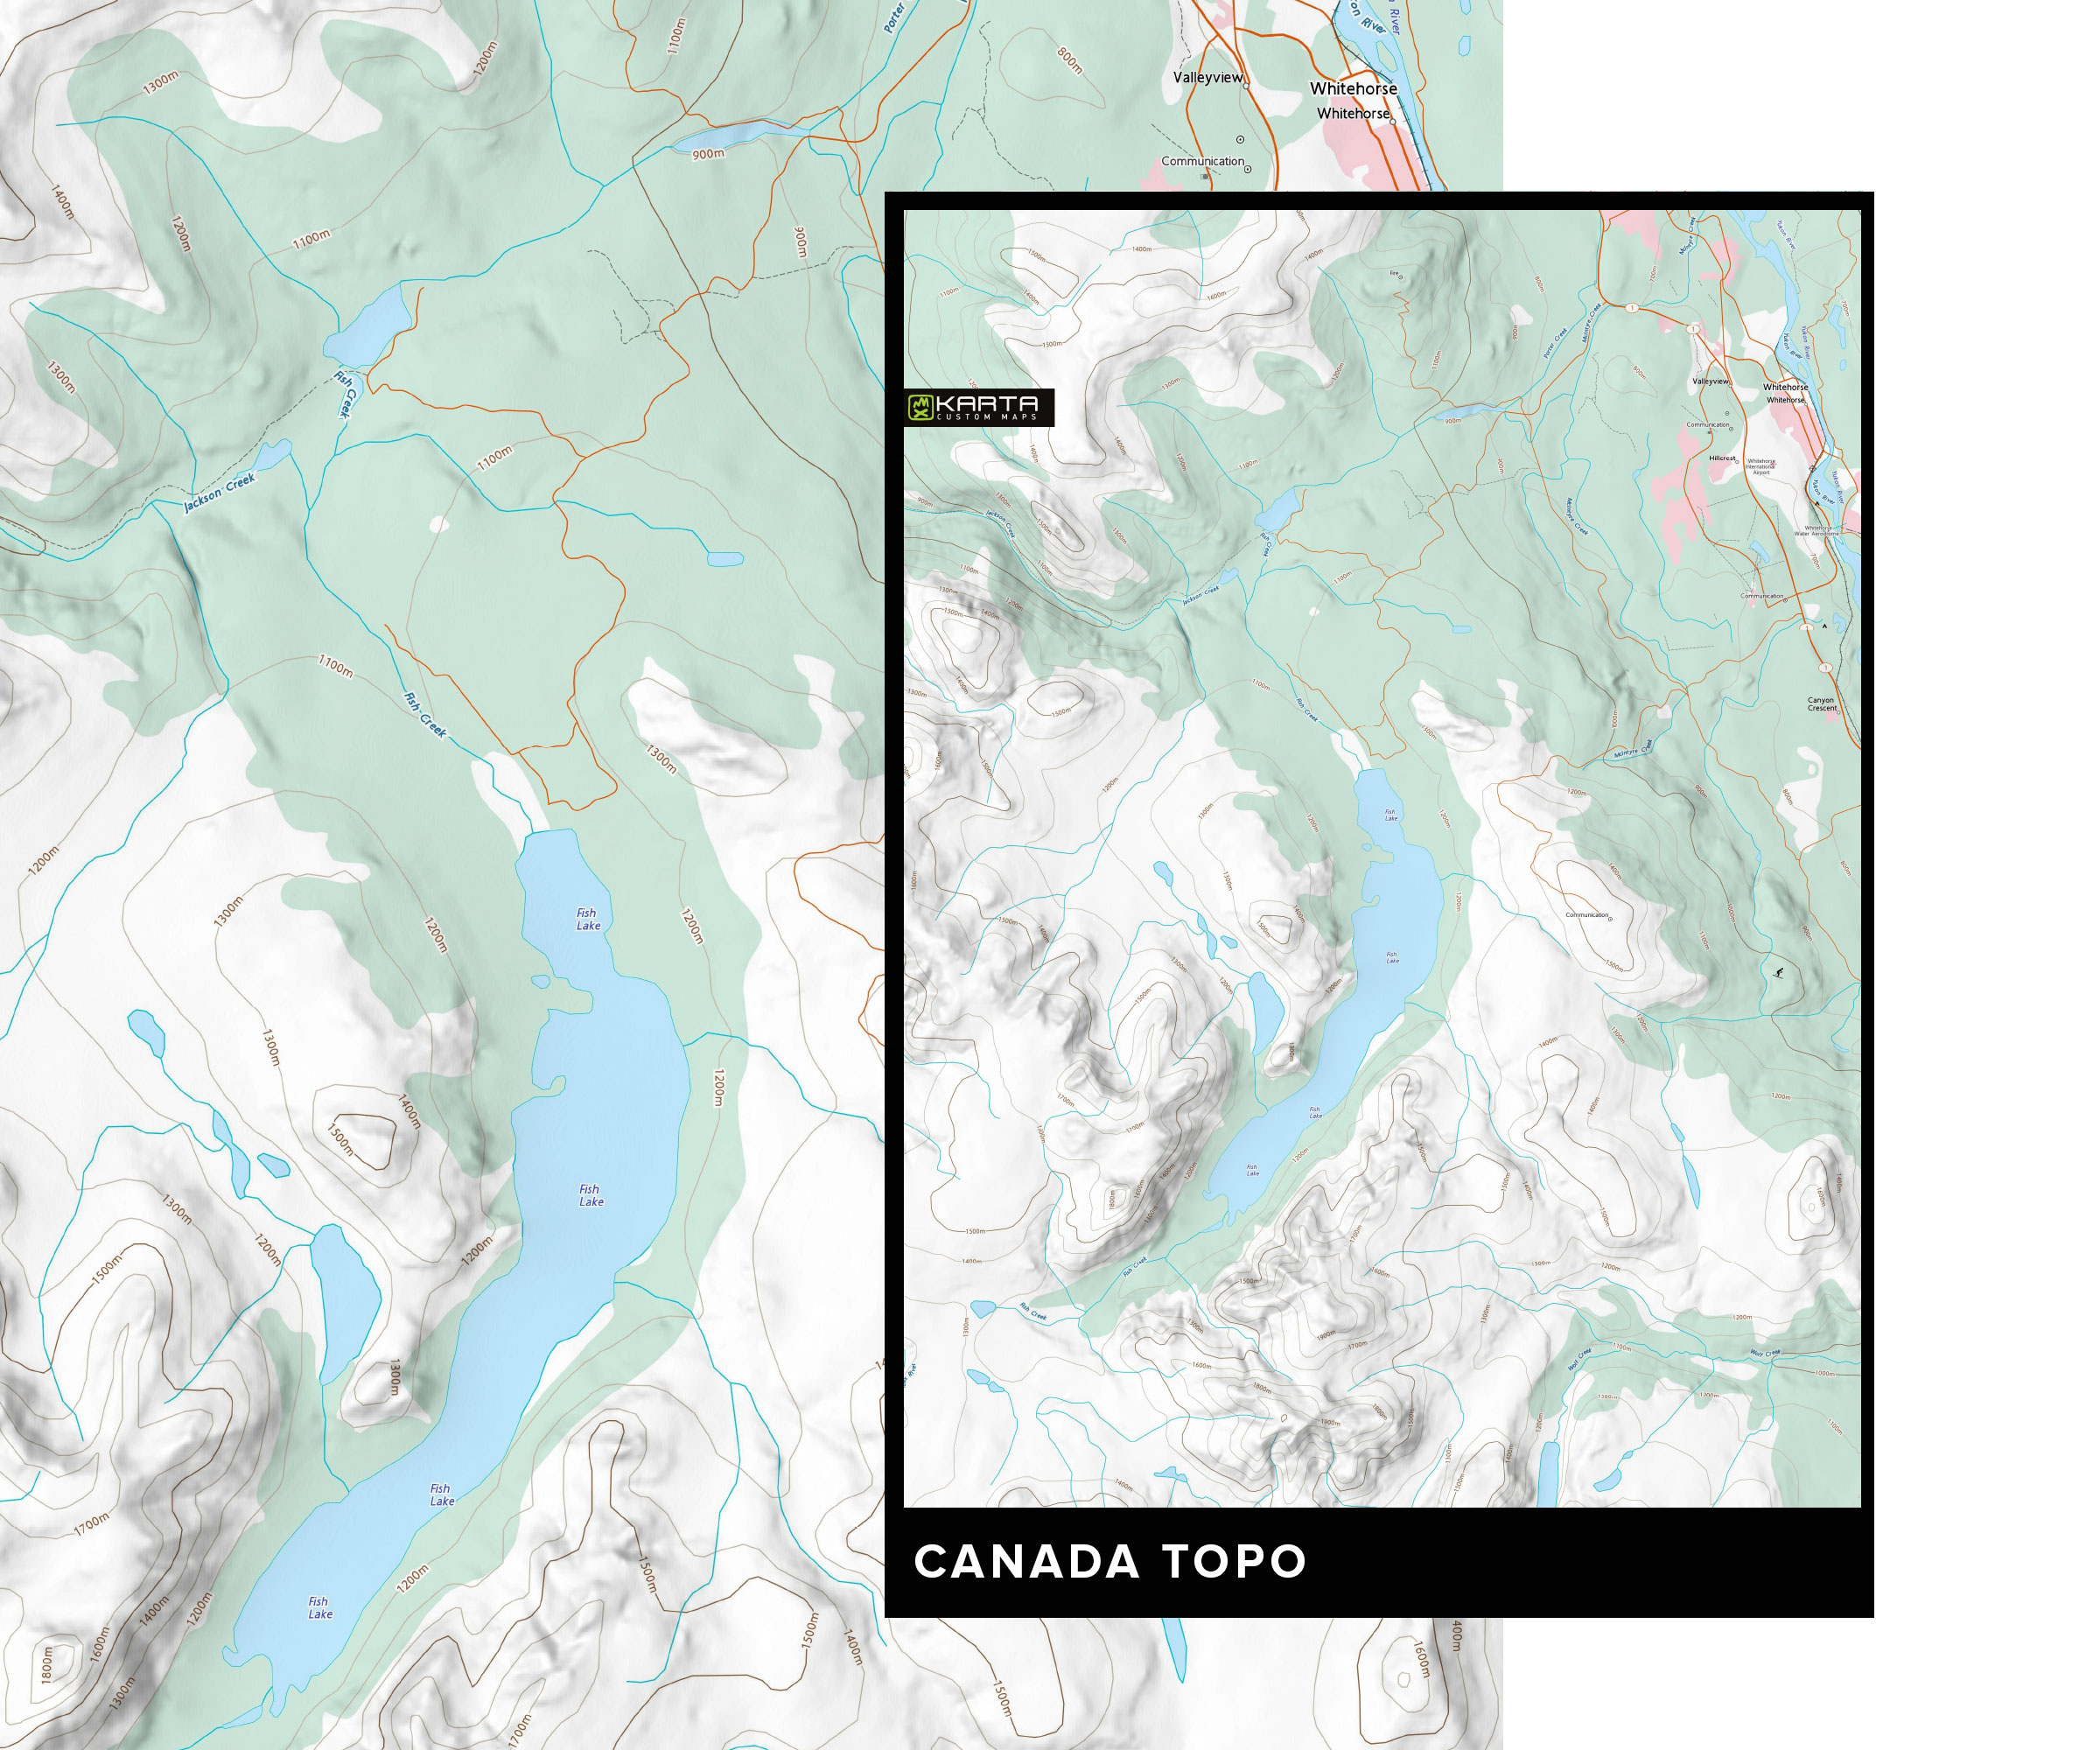 KARTA_NORTH_Canada_Topo1.jpg